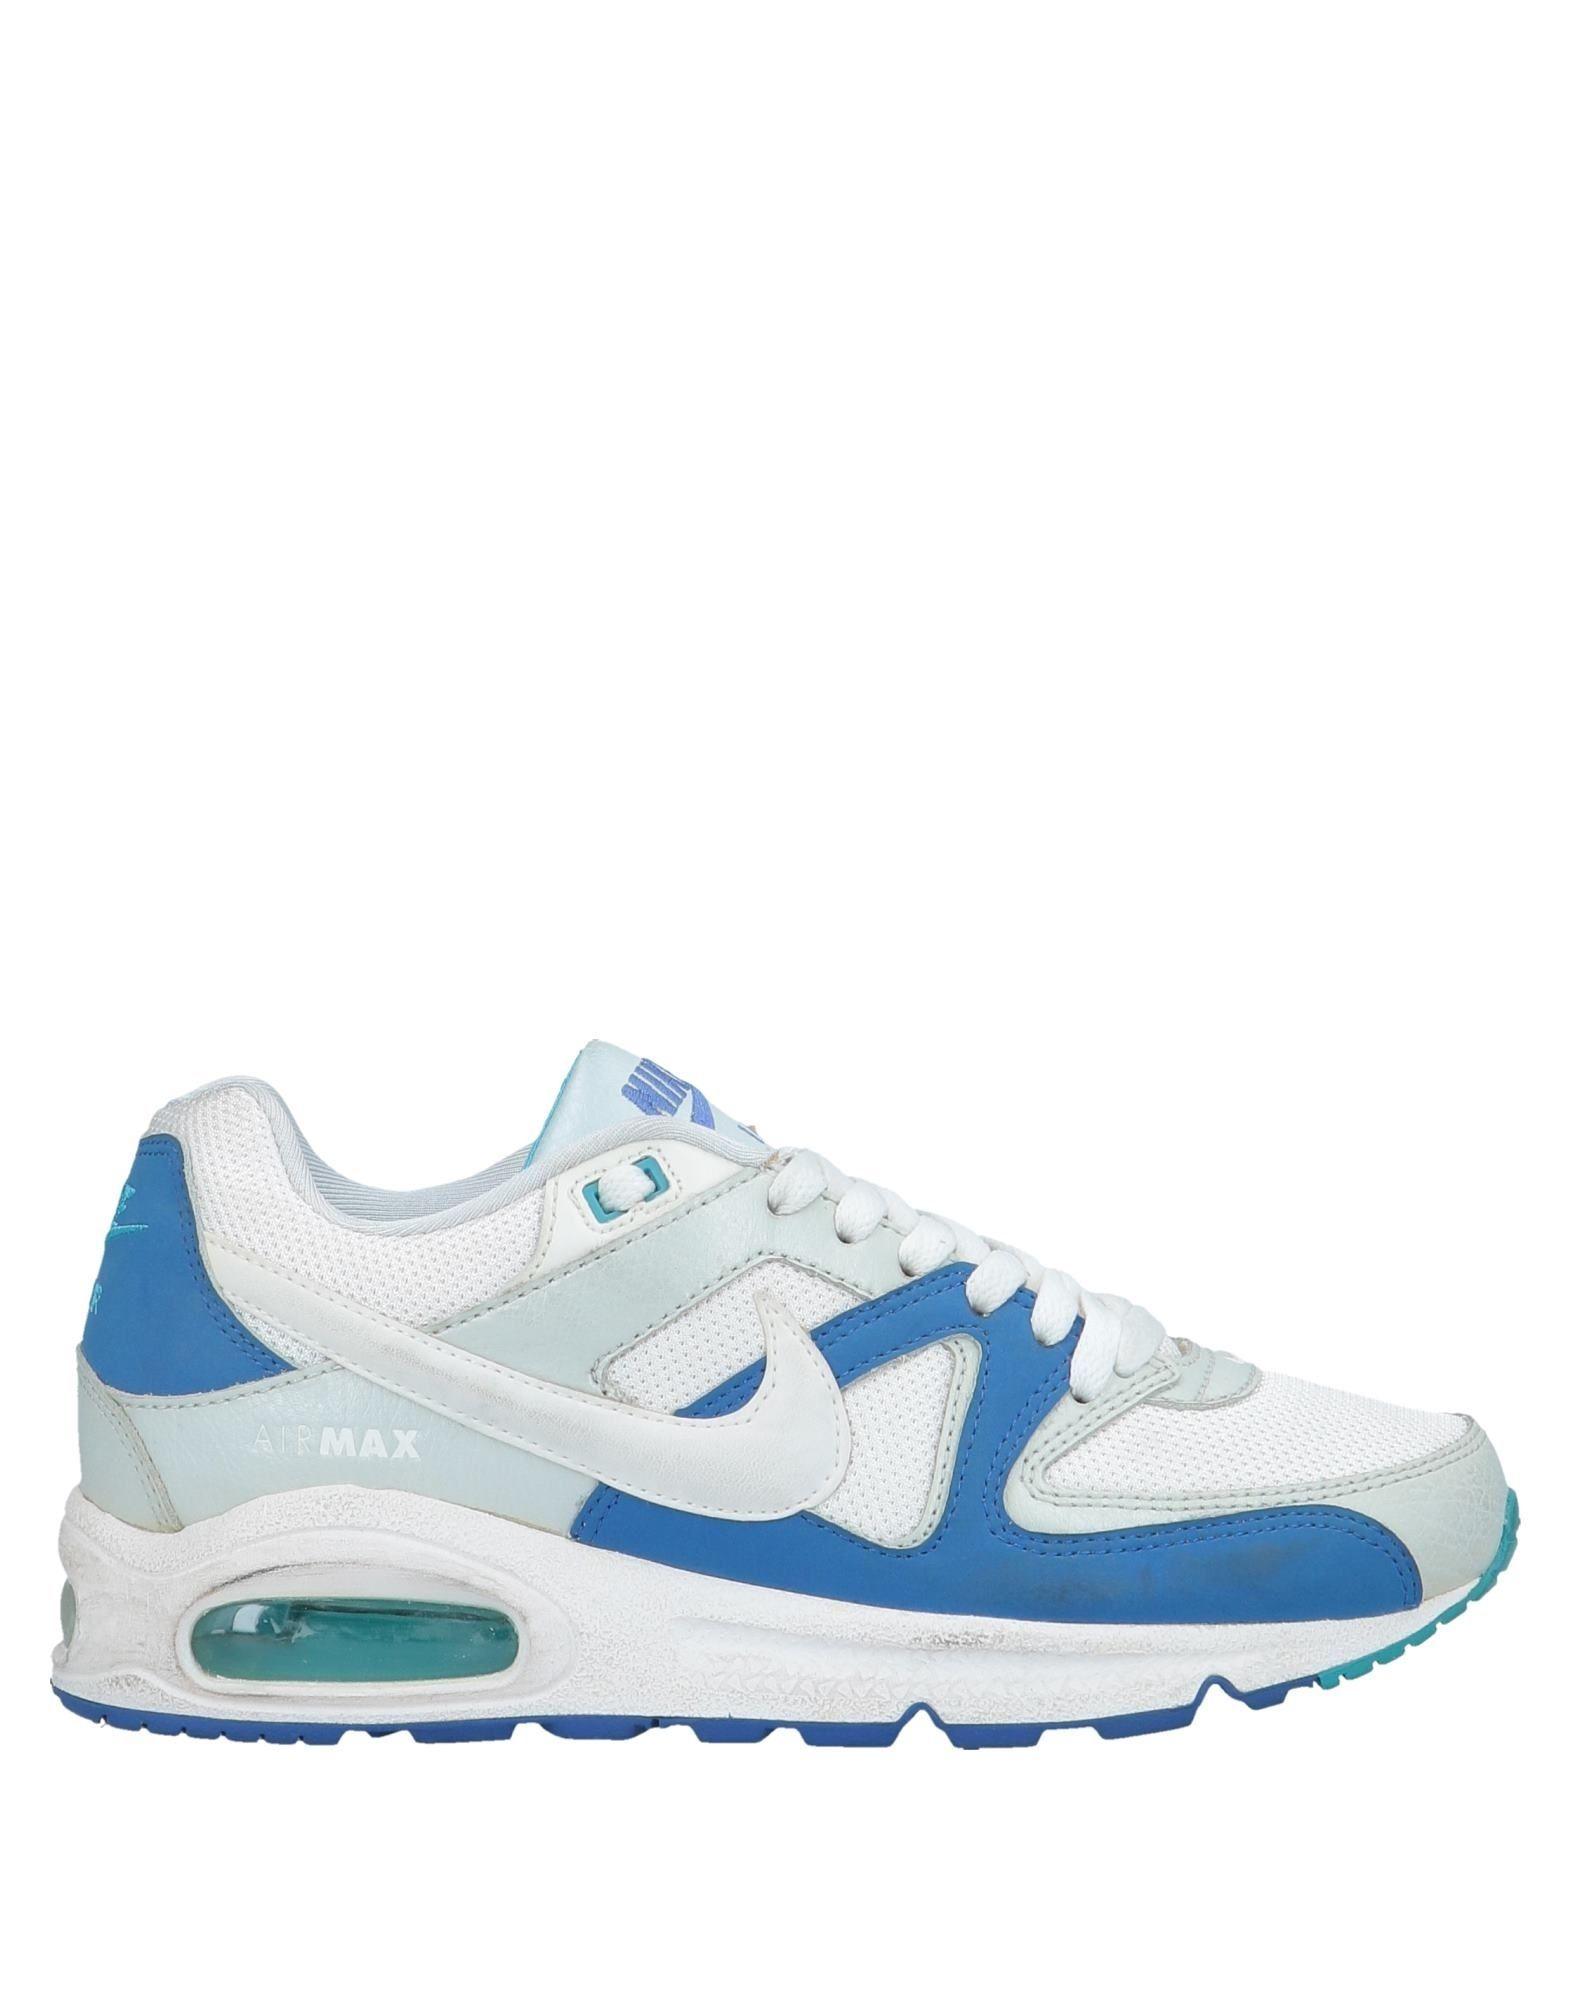 NIKE Sneakers. #nike #shoes in 2019 | Sneakers nike, Nike